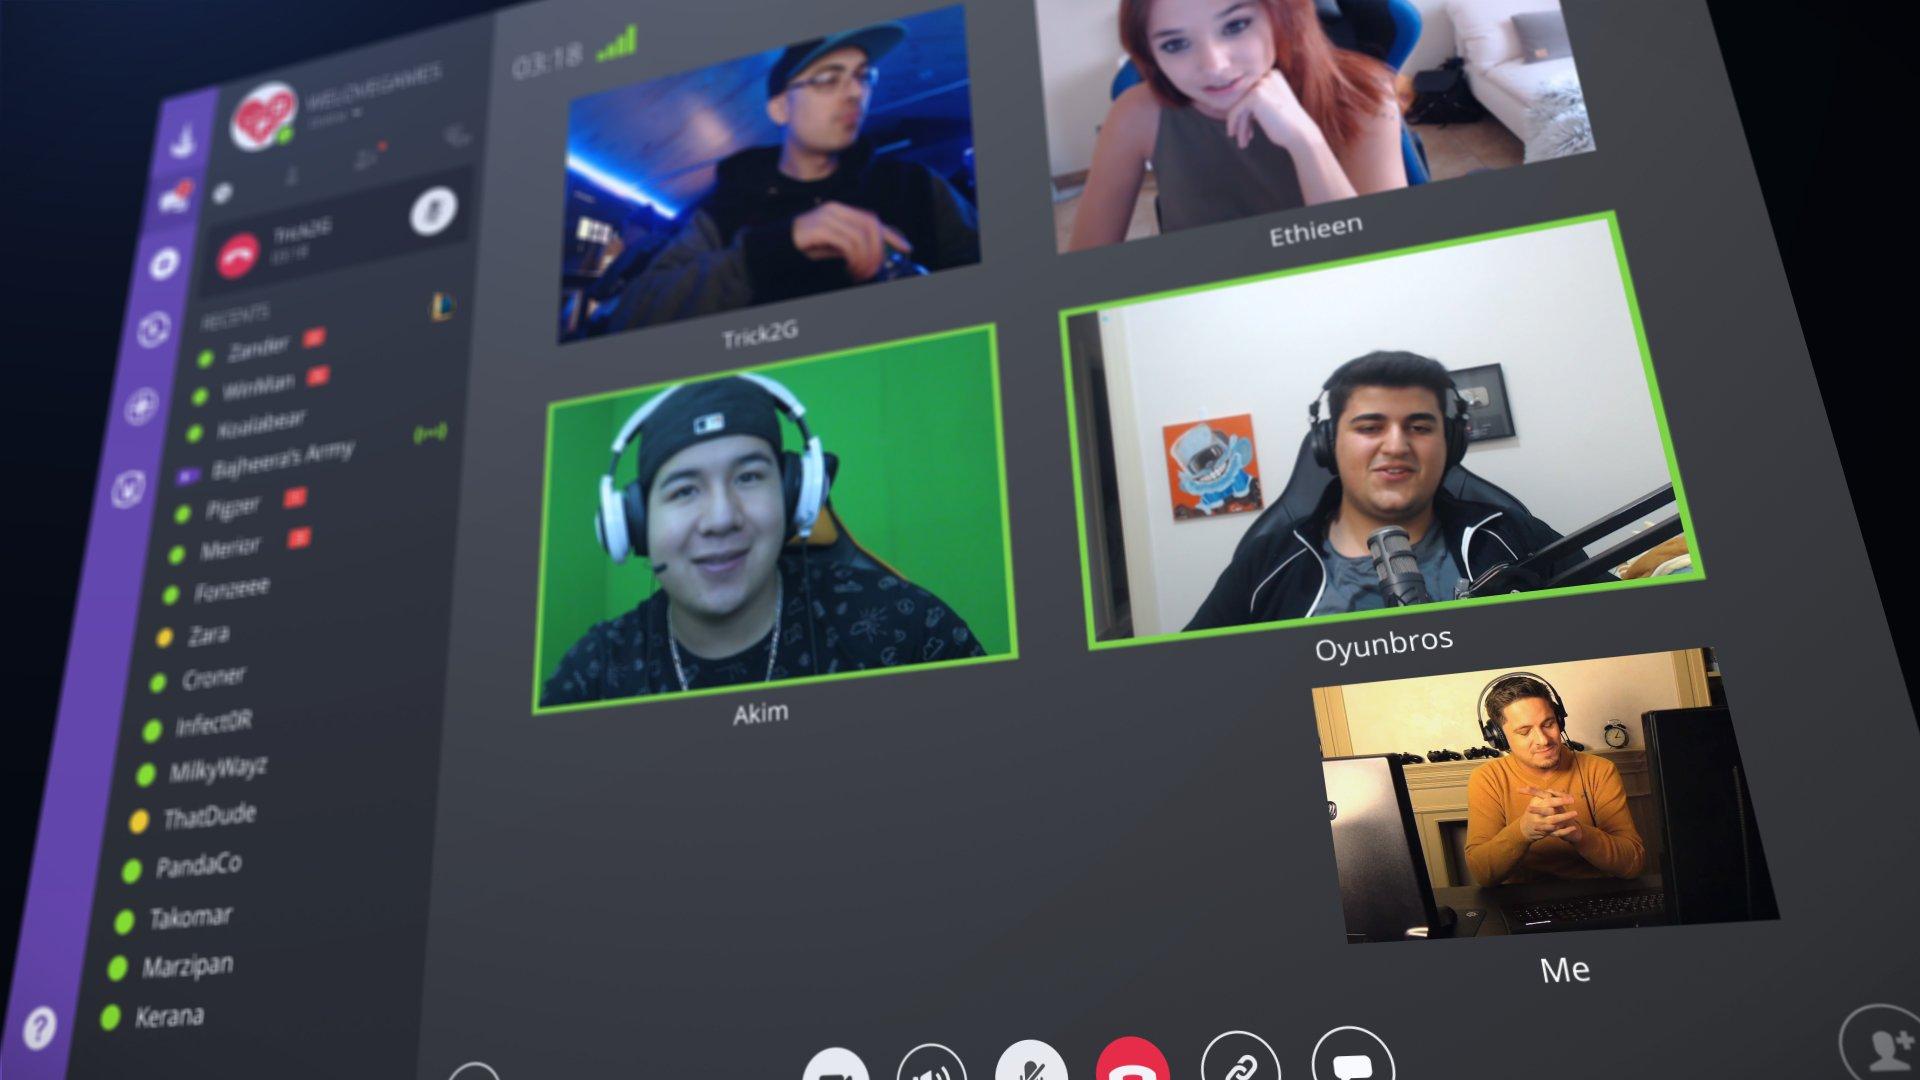 curse-app-video-chat